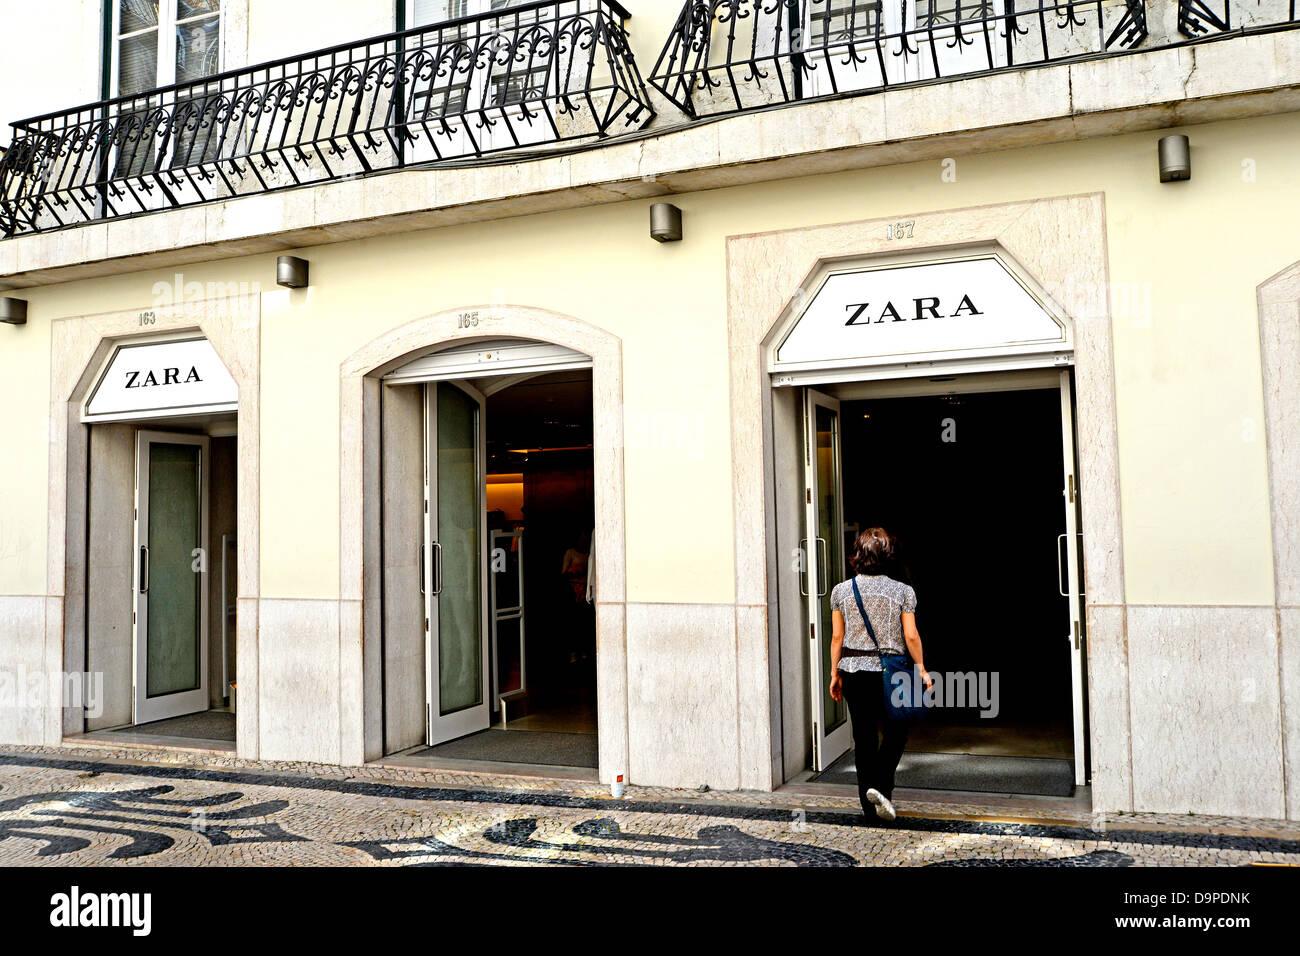 Zara boutique Lisbon Portugal - Stock Image